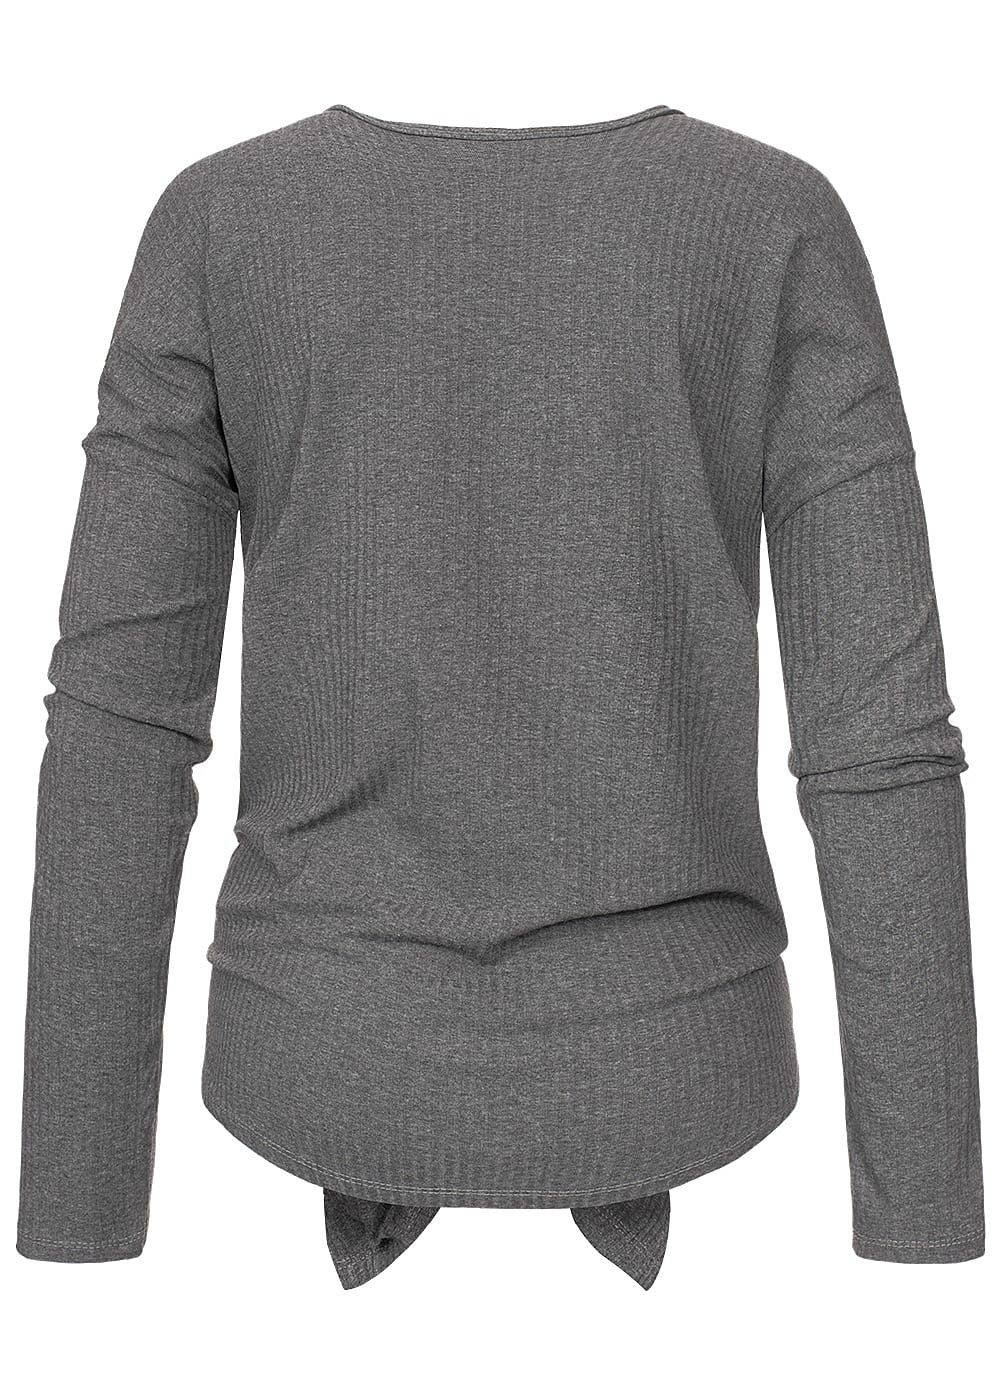 82815fed6eb0bc Styleboom Fashion Damen Ripped Tie-Knot Buttons Shirt dunkel grau ...